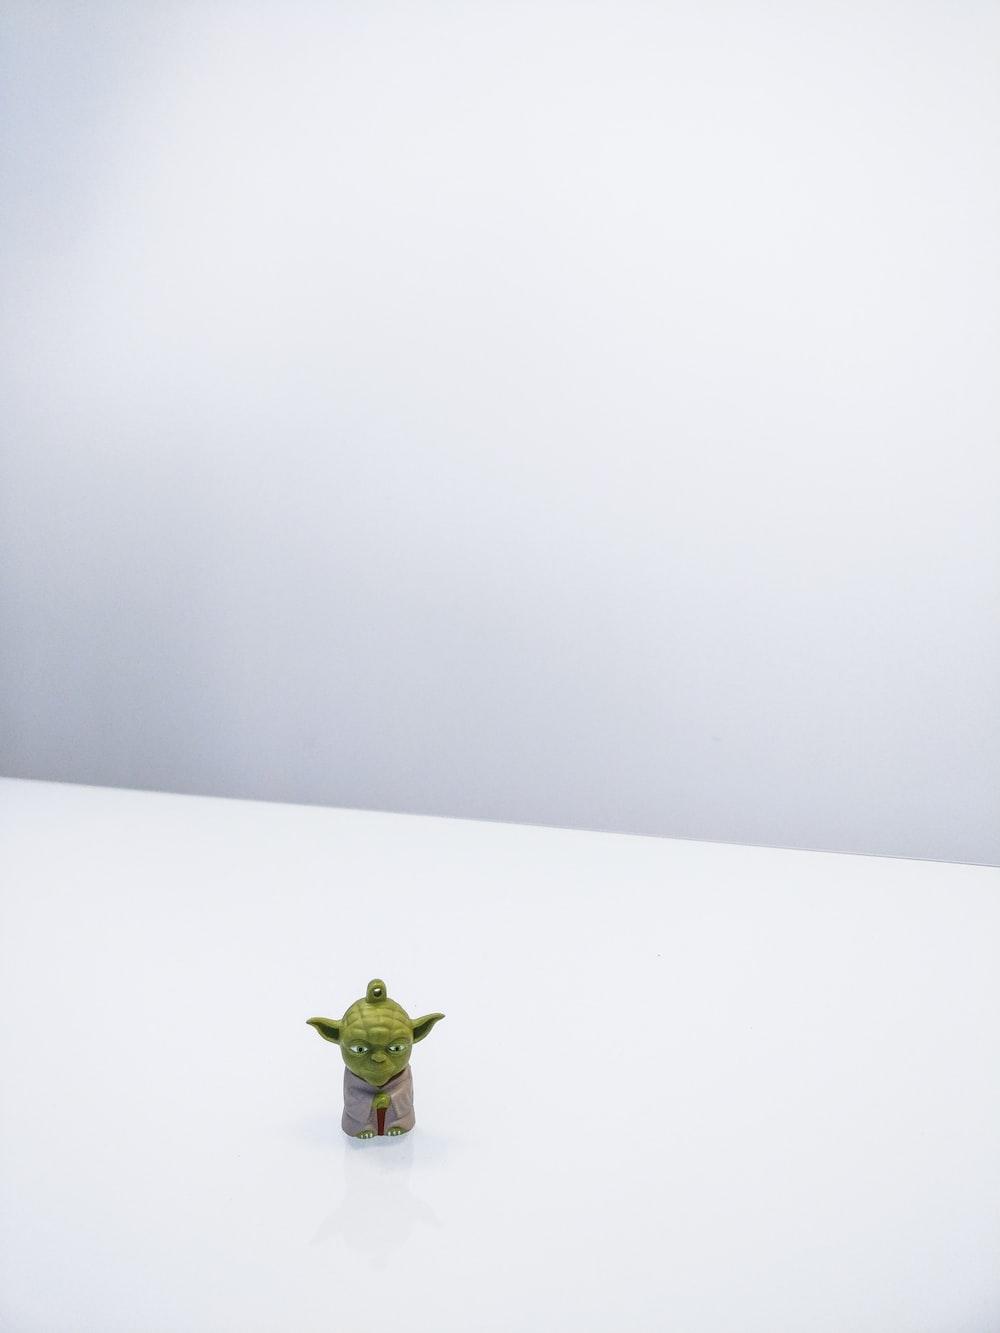 Star Wars Master Yoda minifigure on white surface